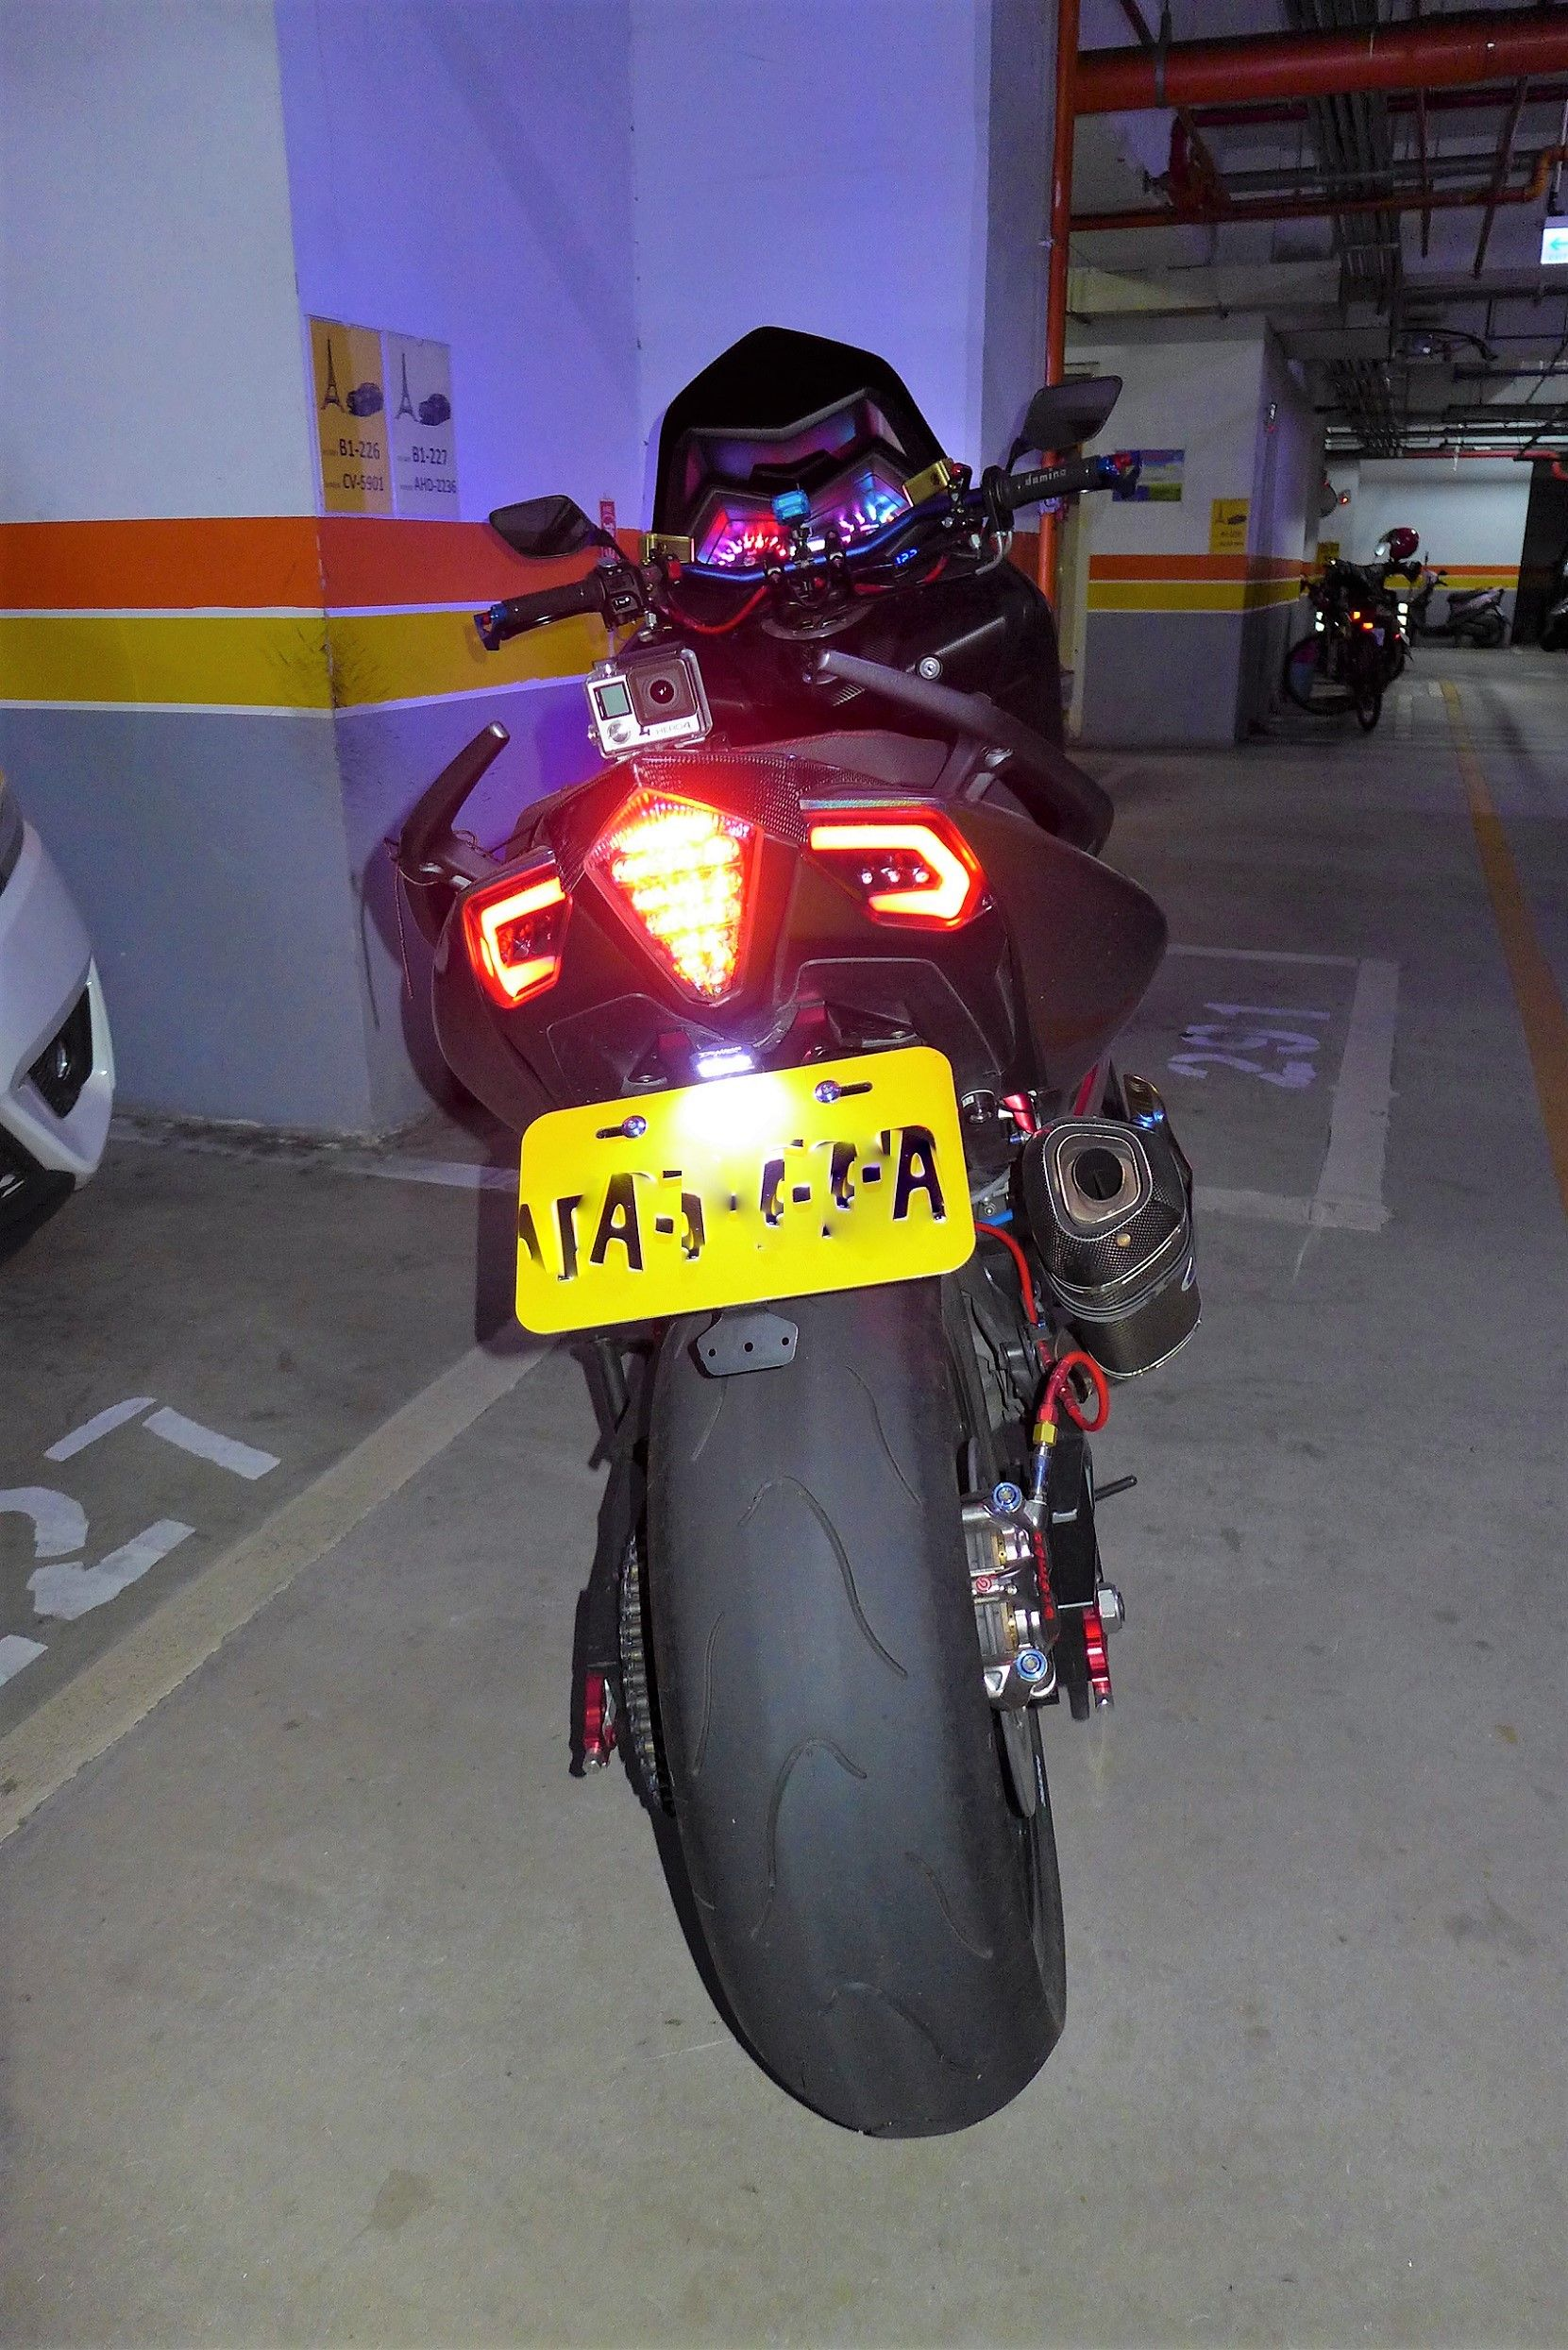 Tmax 530 Motorcycle Scooter Yamaha